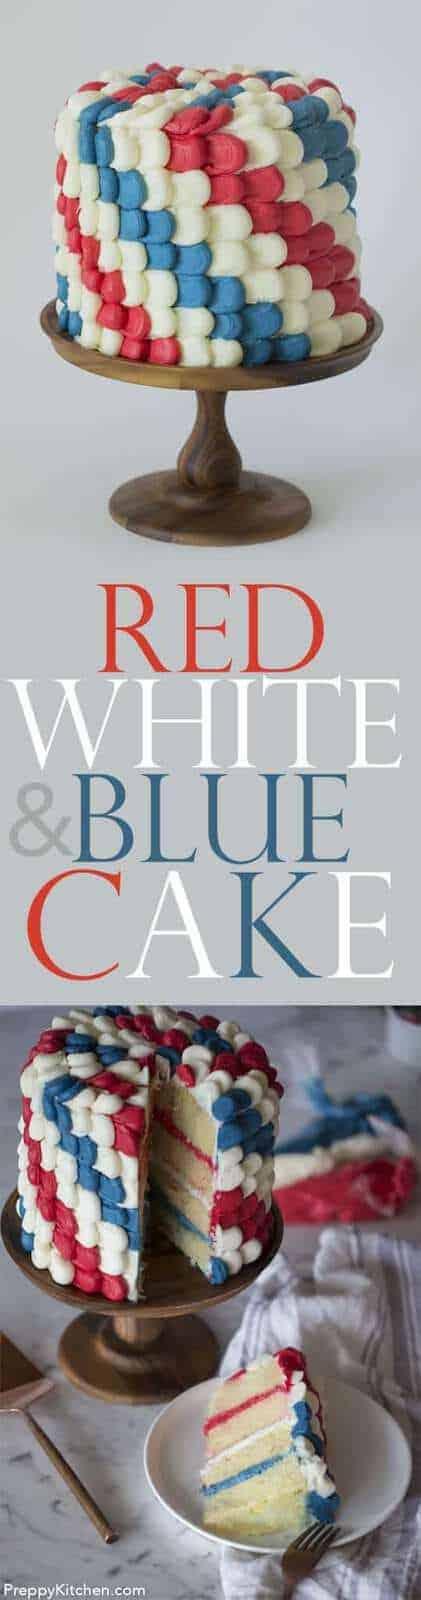 Red, White & Blue Cake